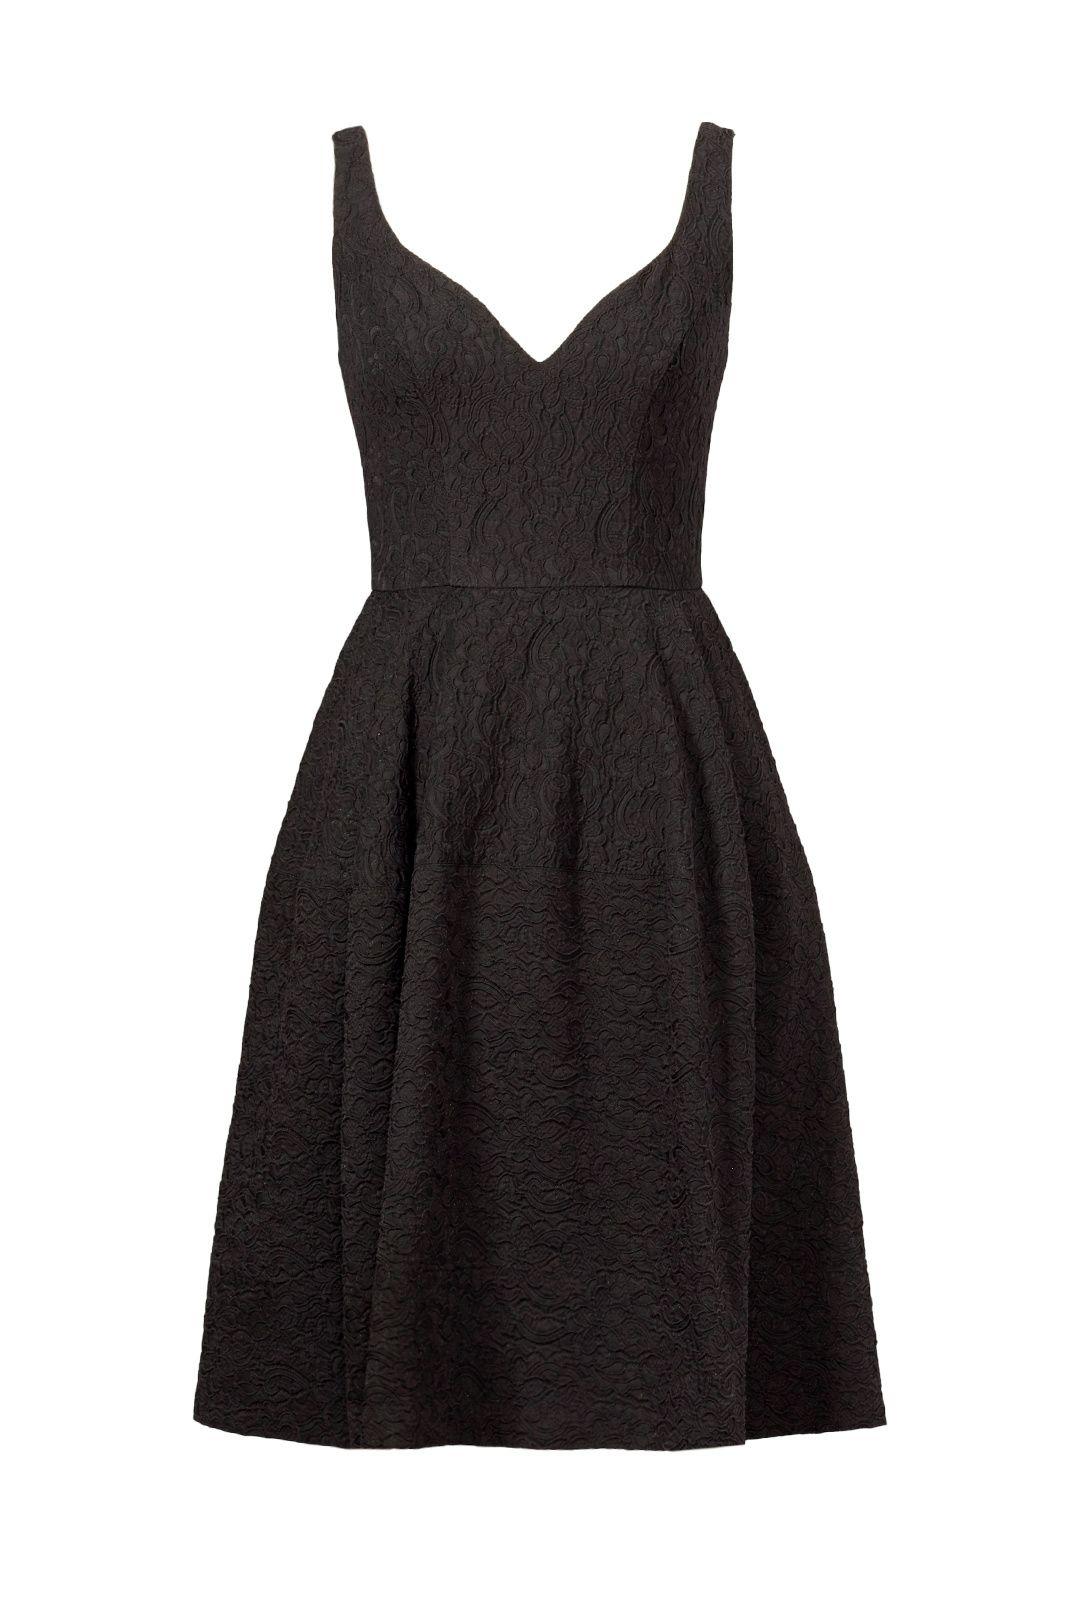 c560d21030 Jet Black Dress by Jill Jill Stuart Plus Size Formal Dresses